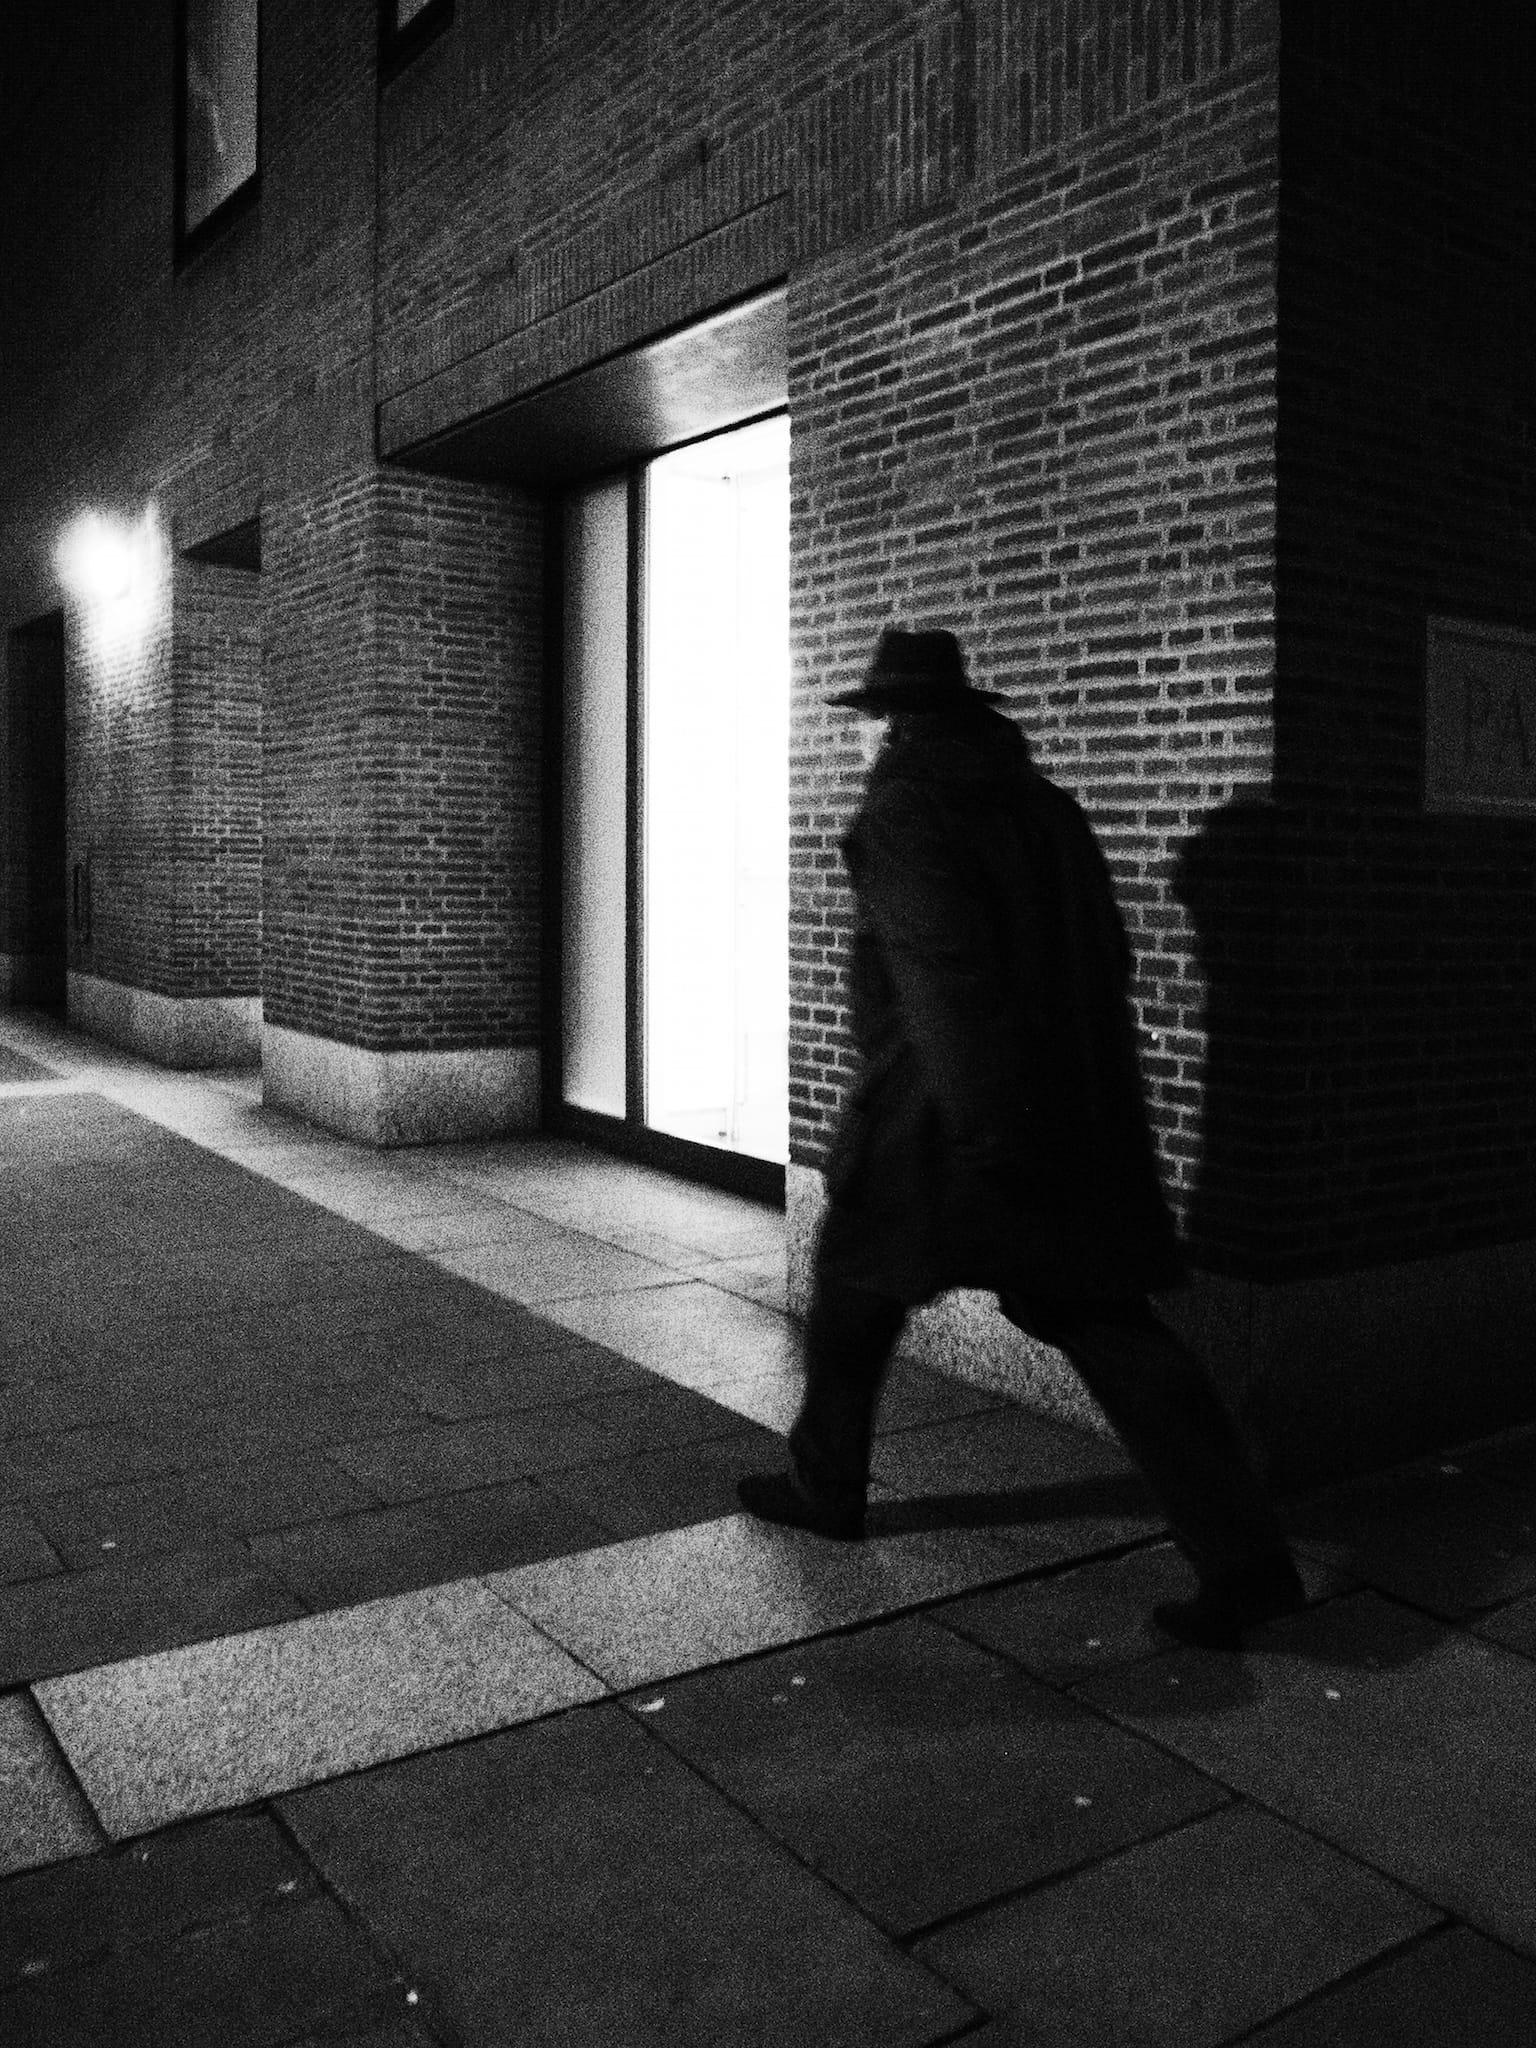 City Noir by Bill Wellham.  Shot in City of London,  November 2012